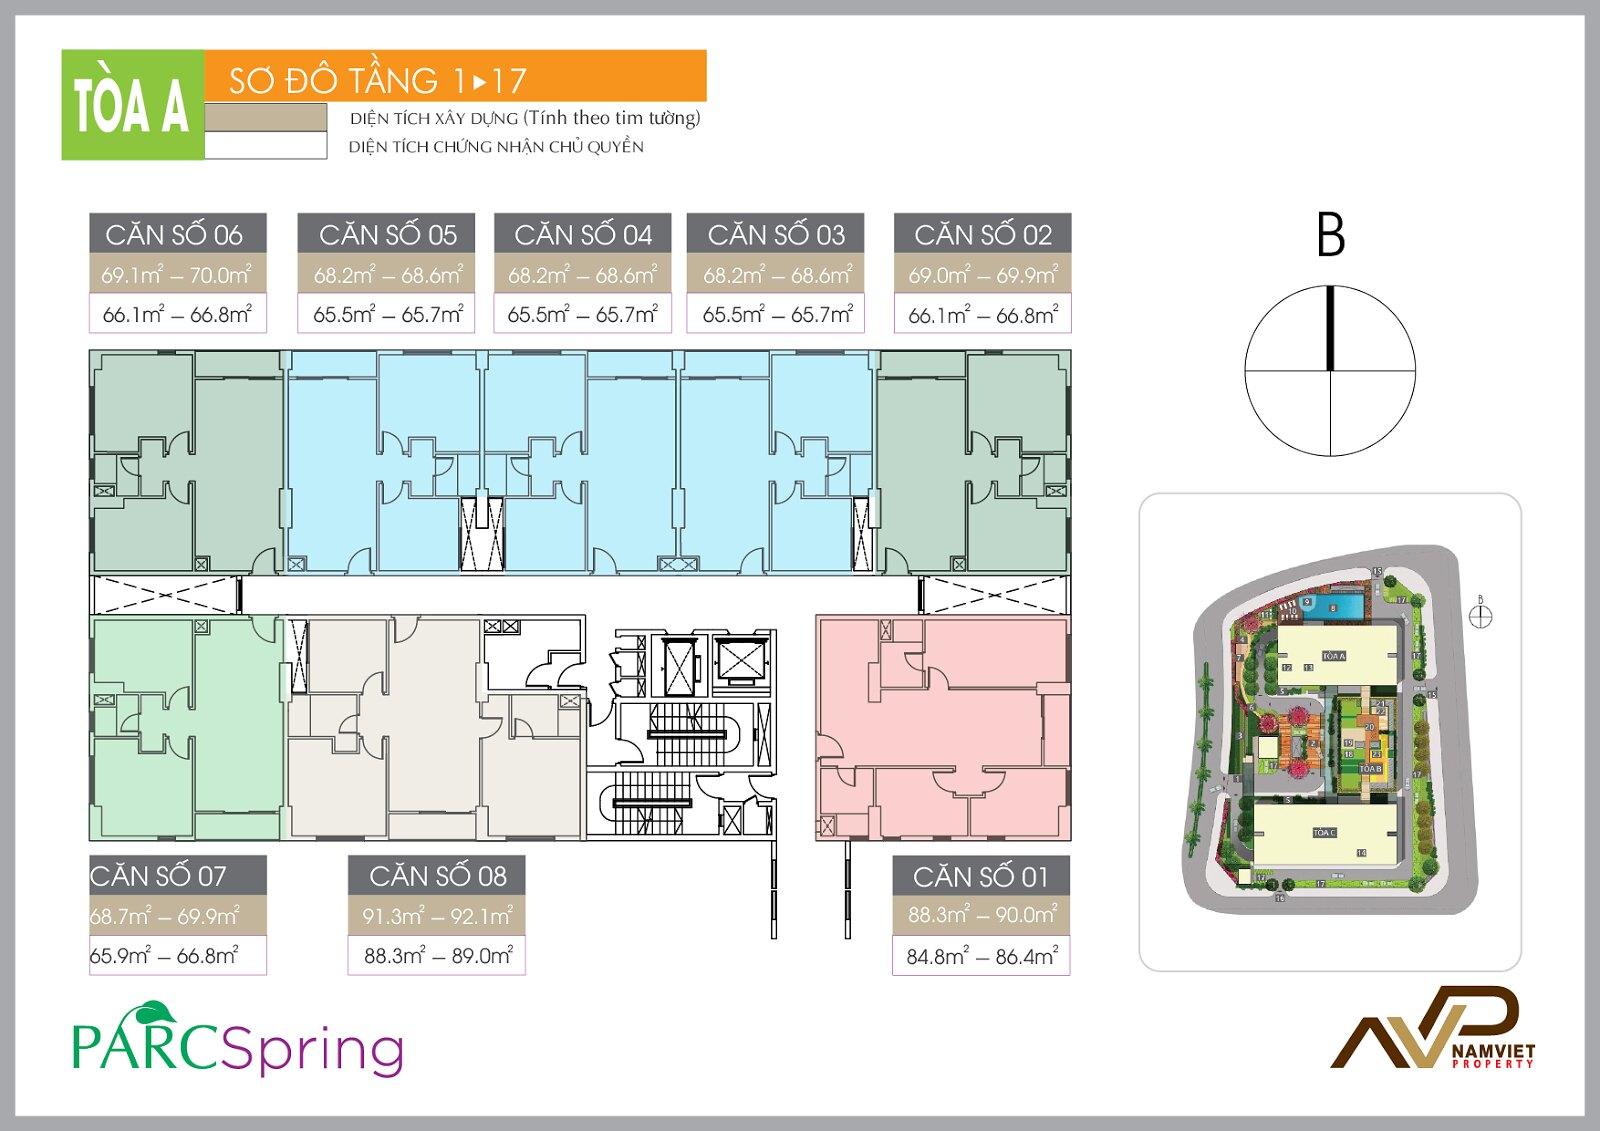 sơ đồ tầng 1-17 Block A